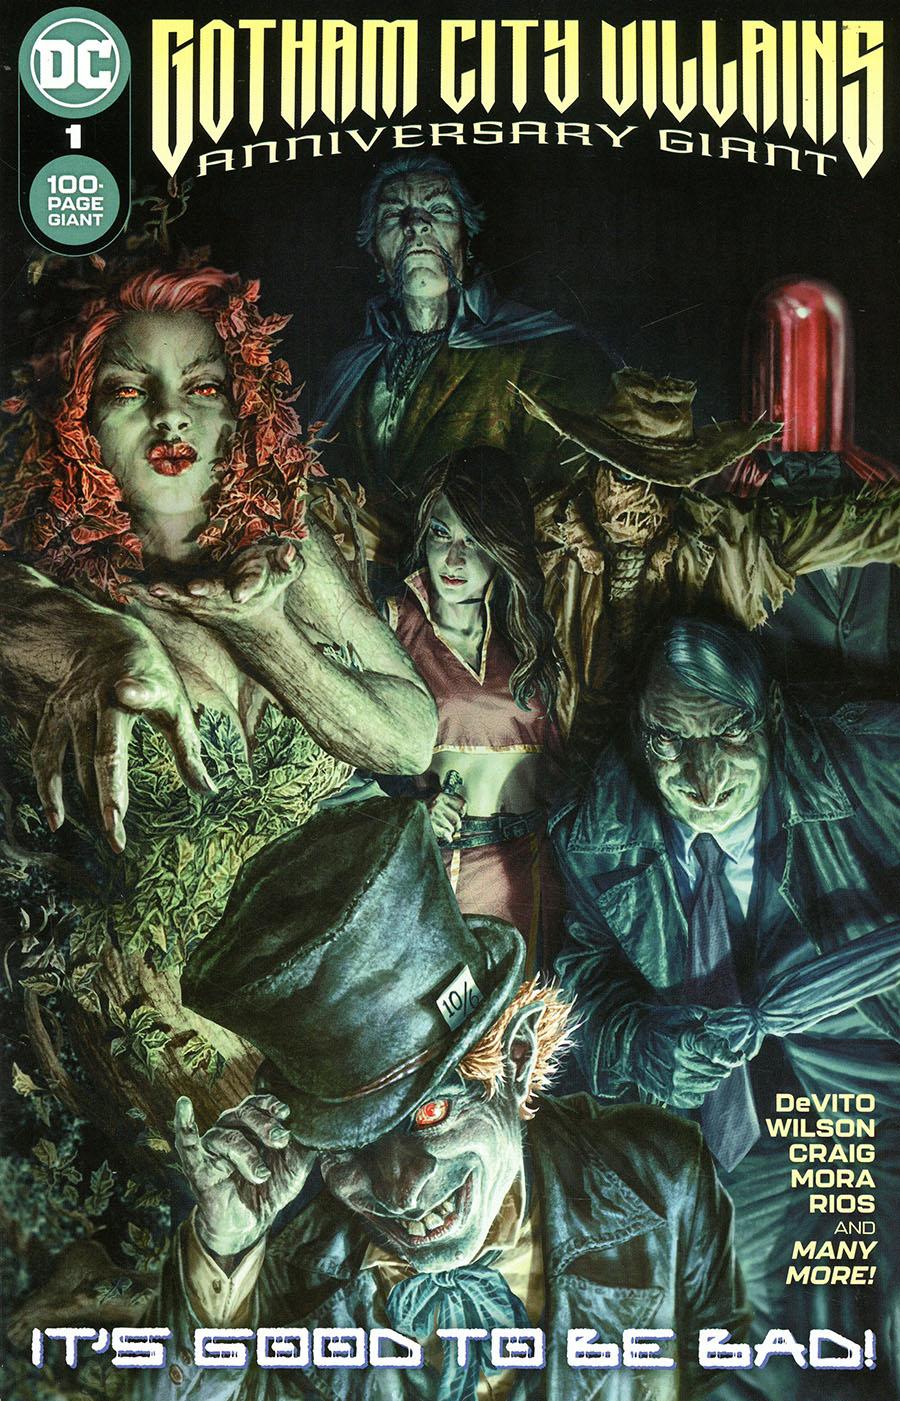 Gotham City Villains Anniversary Giant #1 (One Shot) Cover A Regular Lee Bermejo Cover